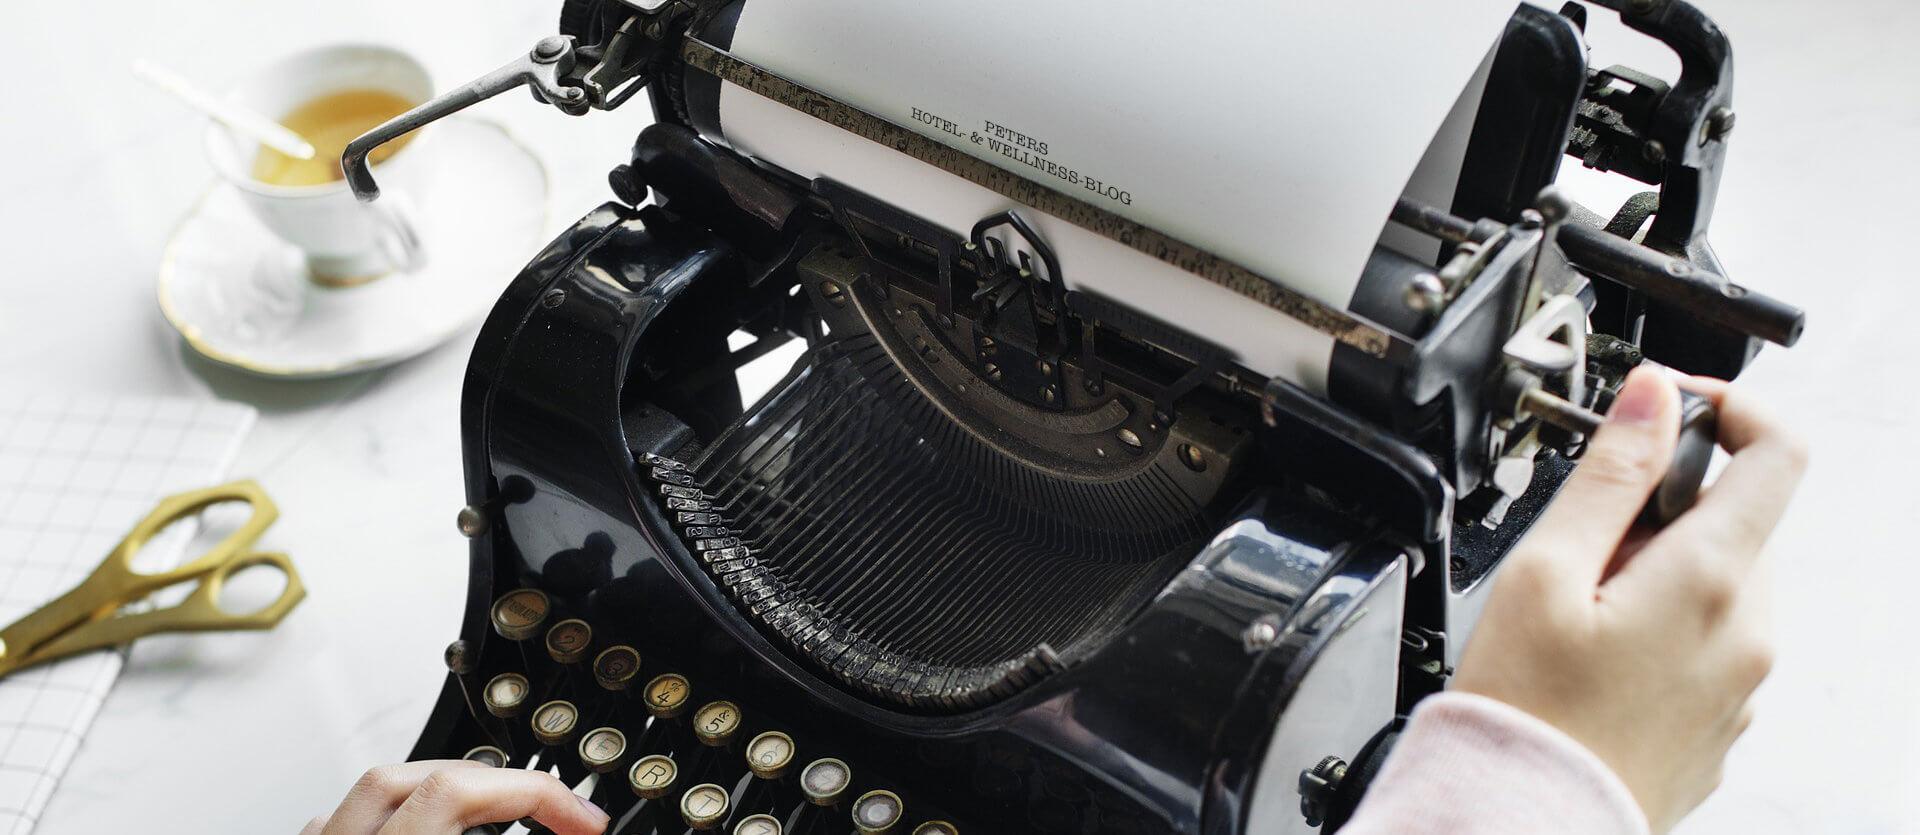 PETERS Hotel- & Wellness-Blog - historische Schreibmaschine